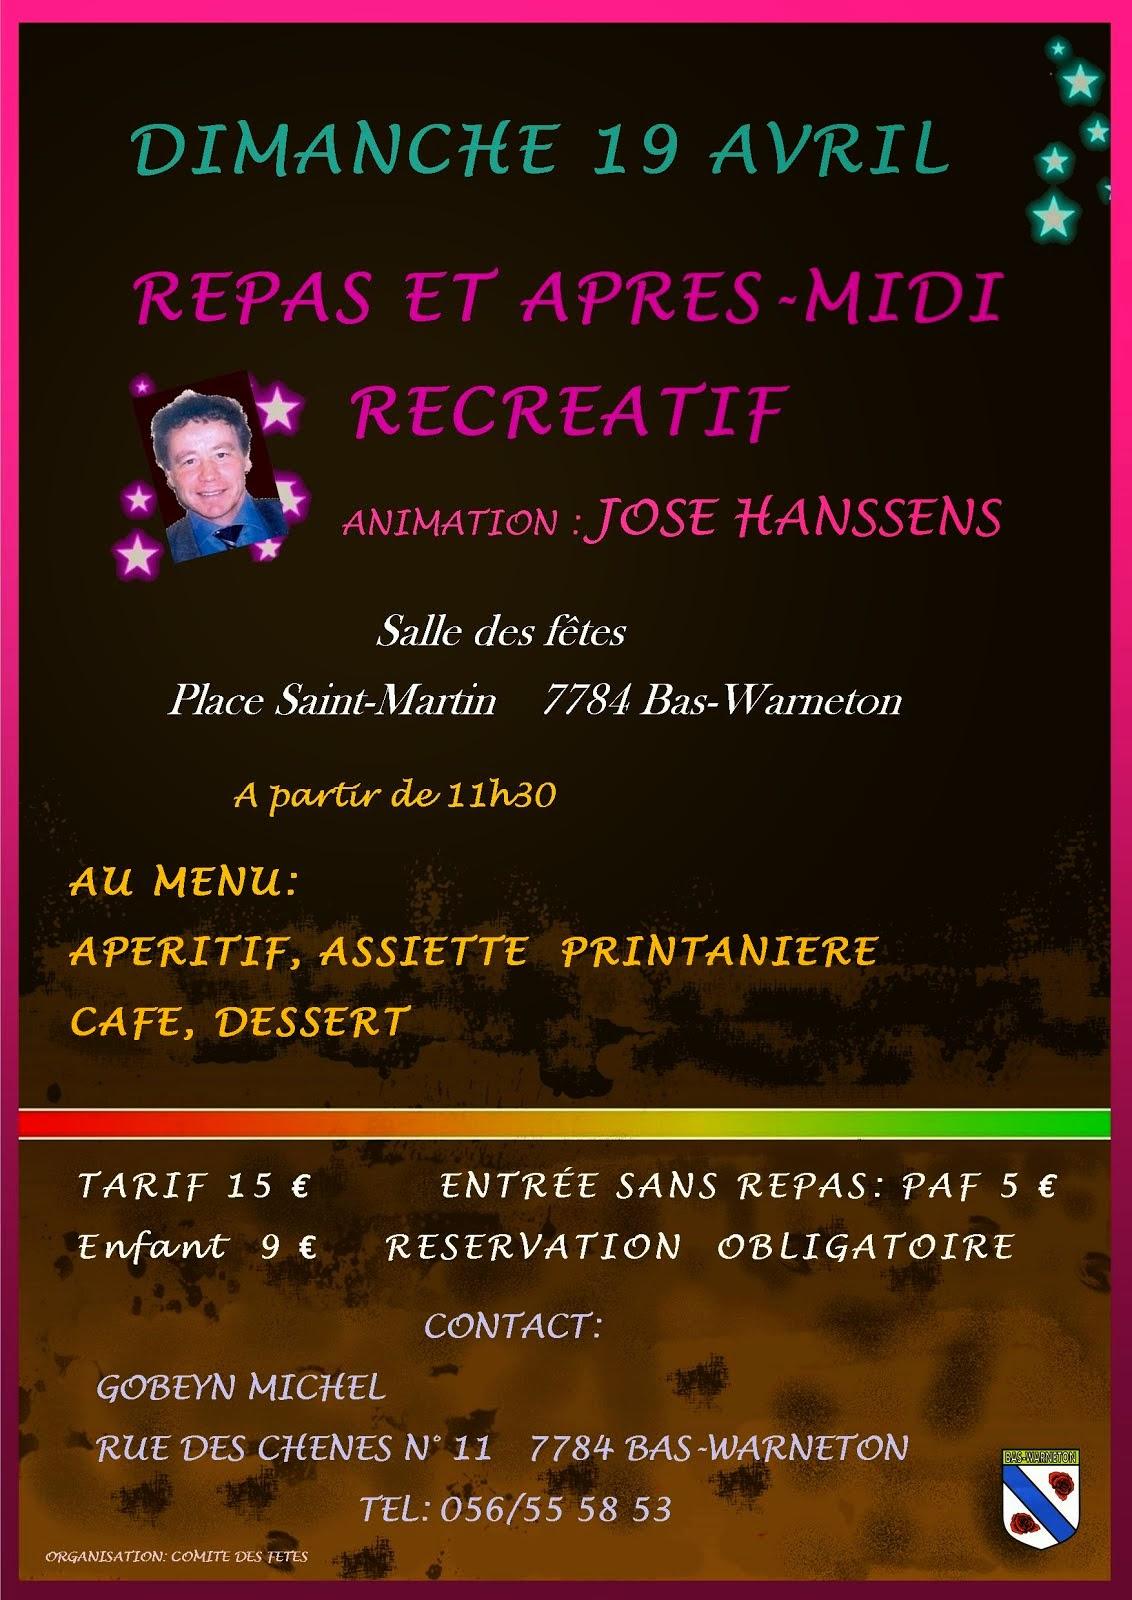 19 AVRIL BAS-WARNETON REPAS DES 11 HEURES ET APRES-MIDI RECREATIF